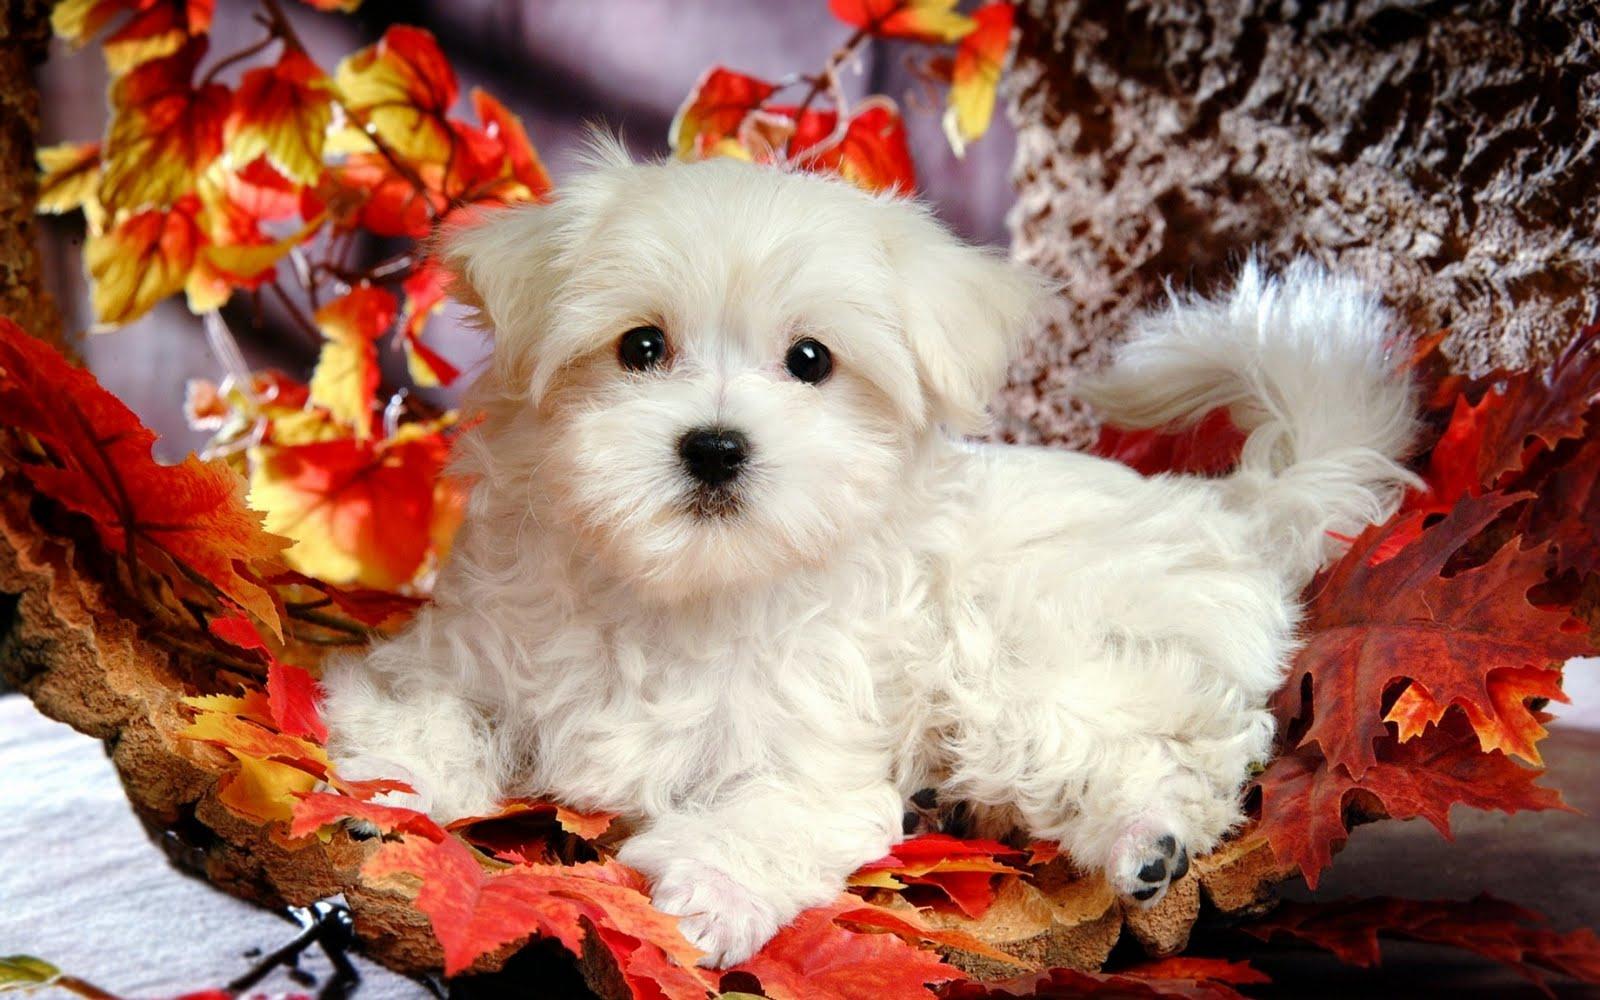 Cute Puppy Wallpaper   Wide1680x1050 Hd Wallpaper 1600x1000